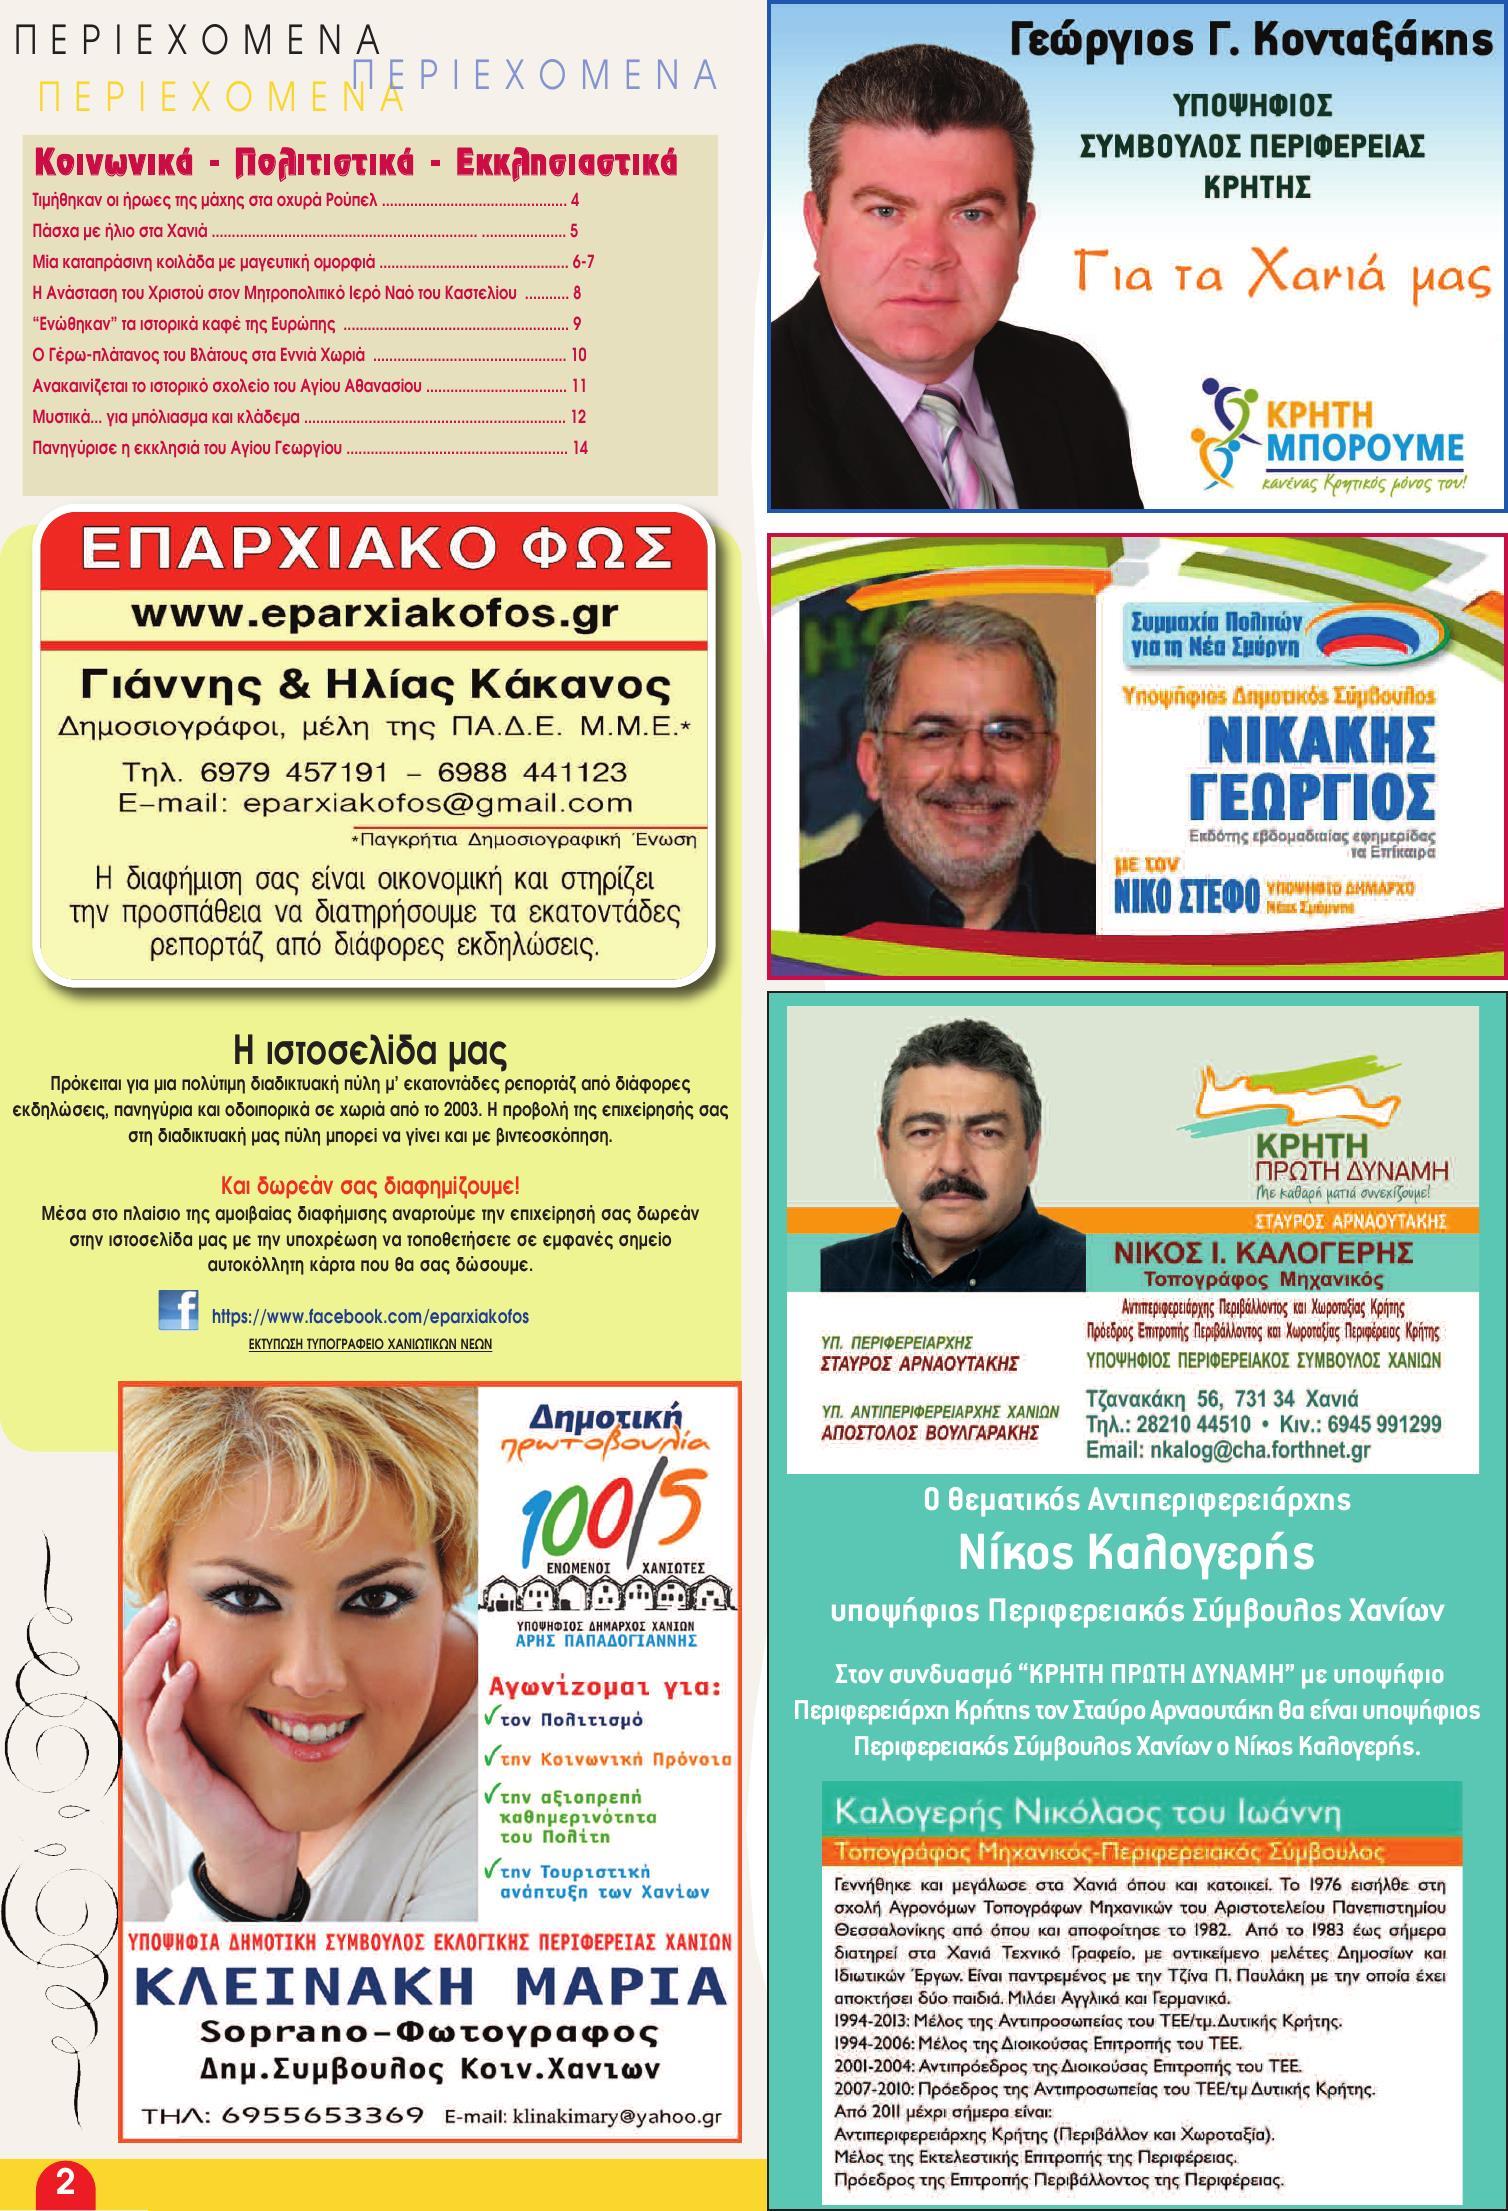 06 kakanos leukoma (Page 02)